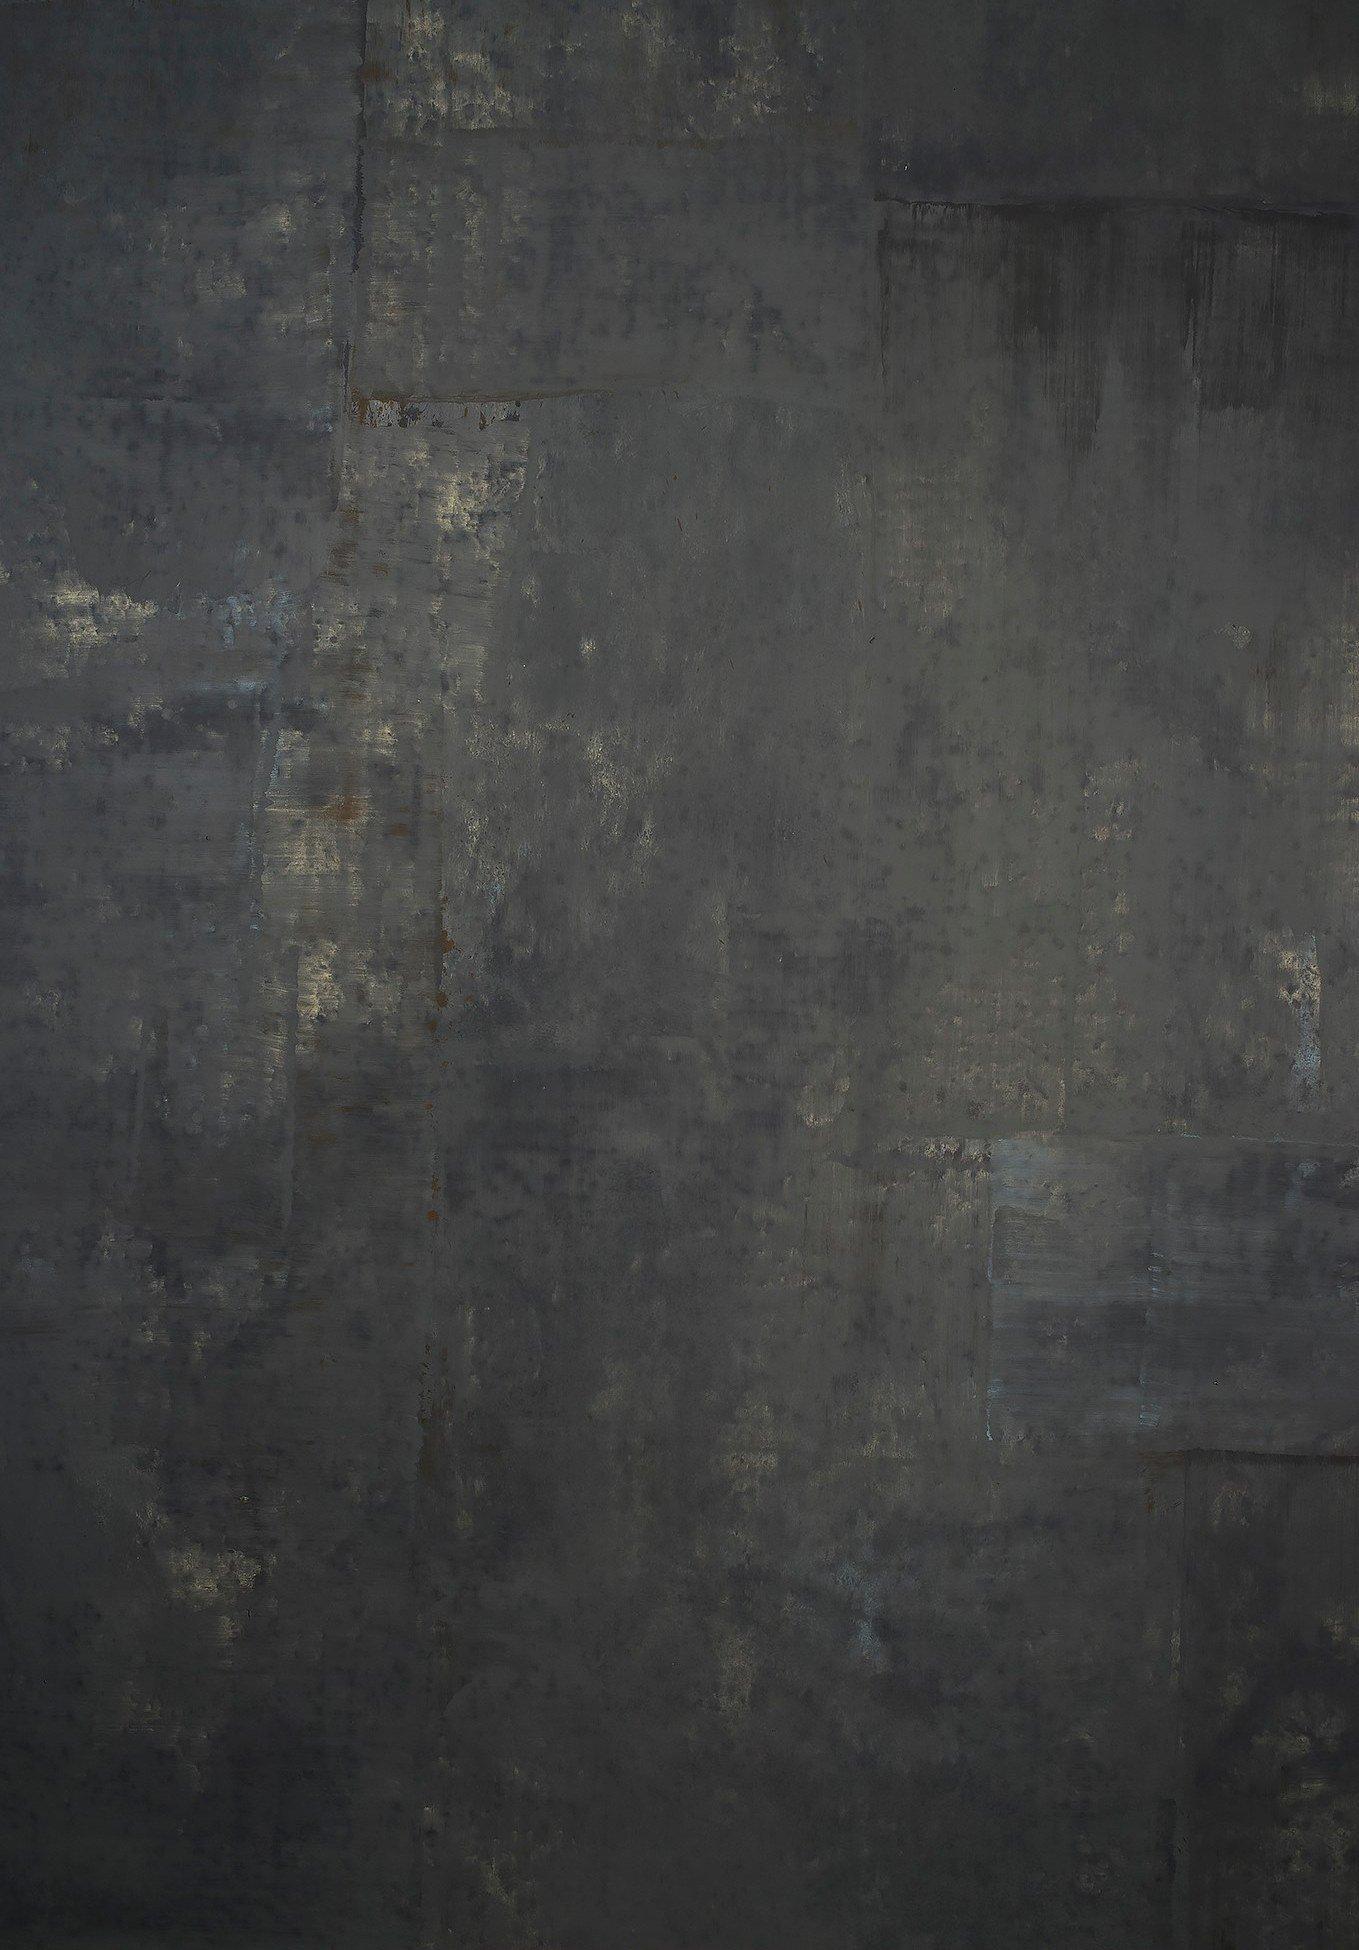 Gravity backdrops hand paint canvas photography studio shoot jose jeuland dark industrial